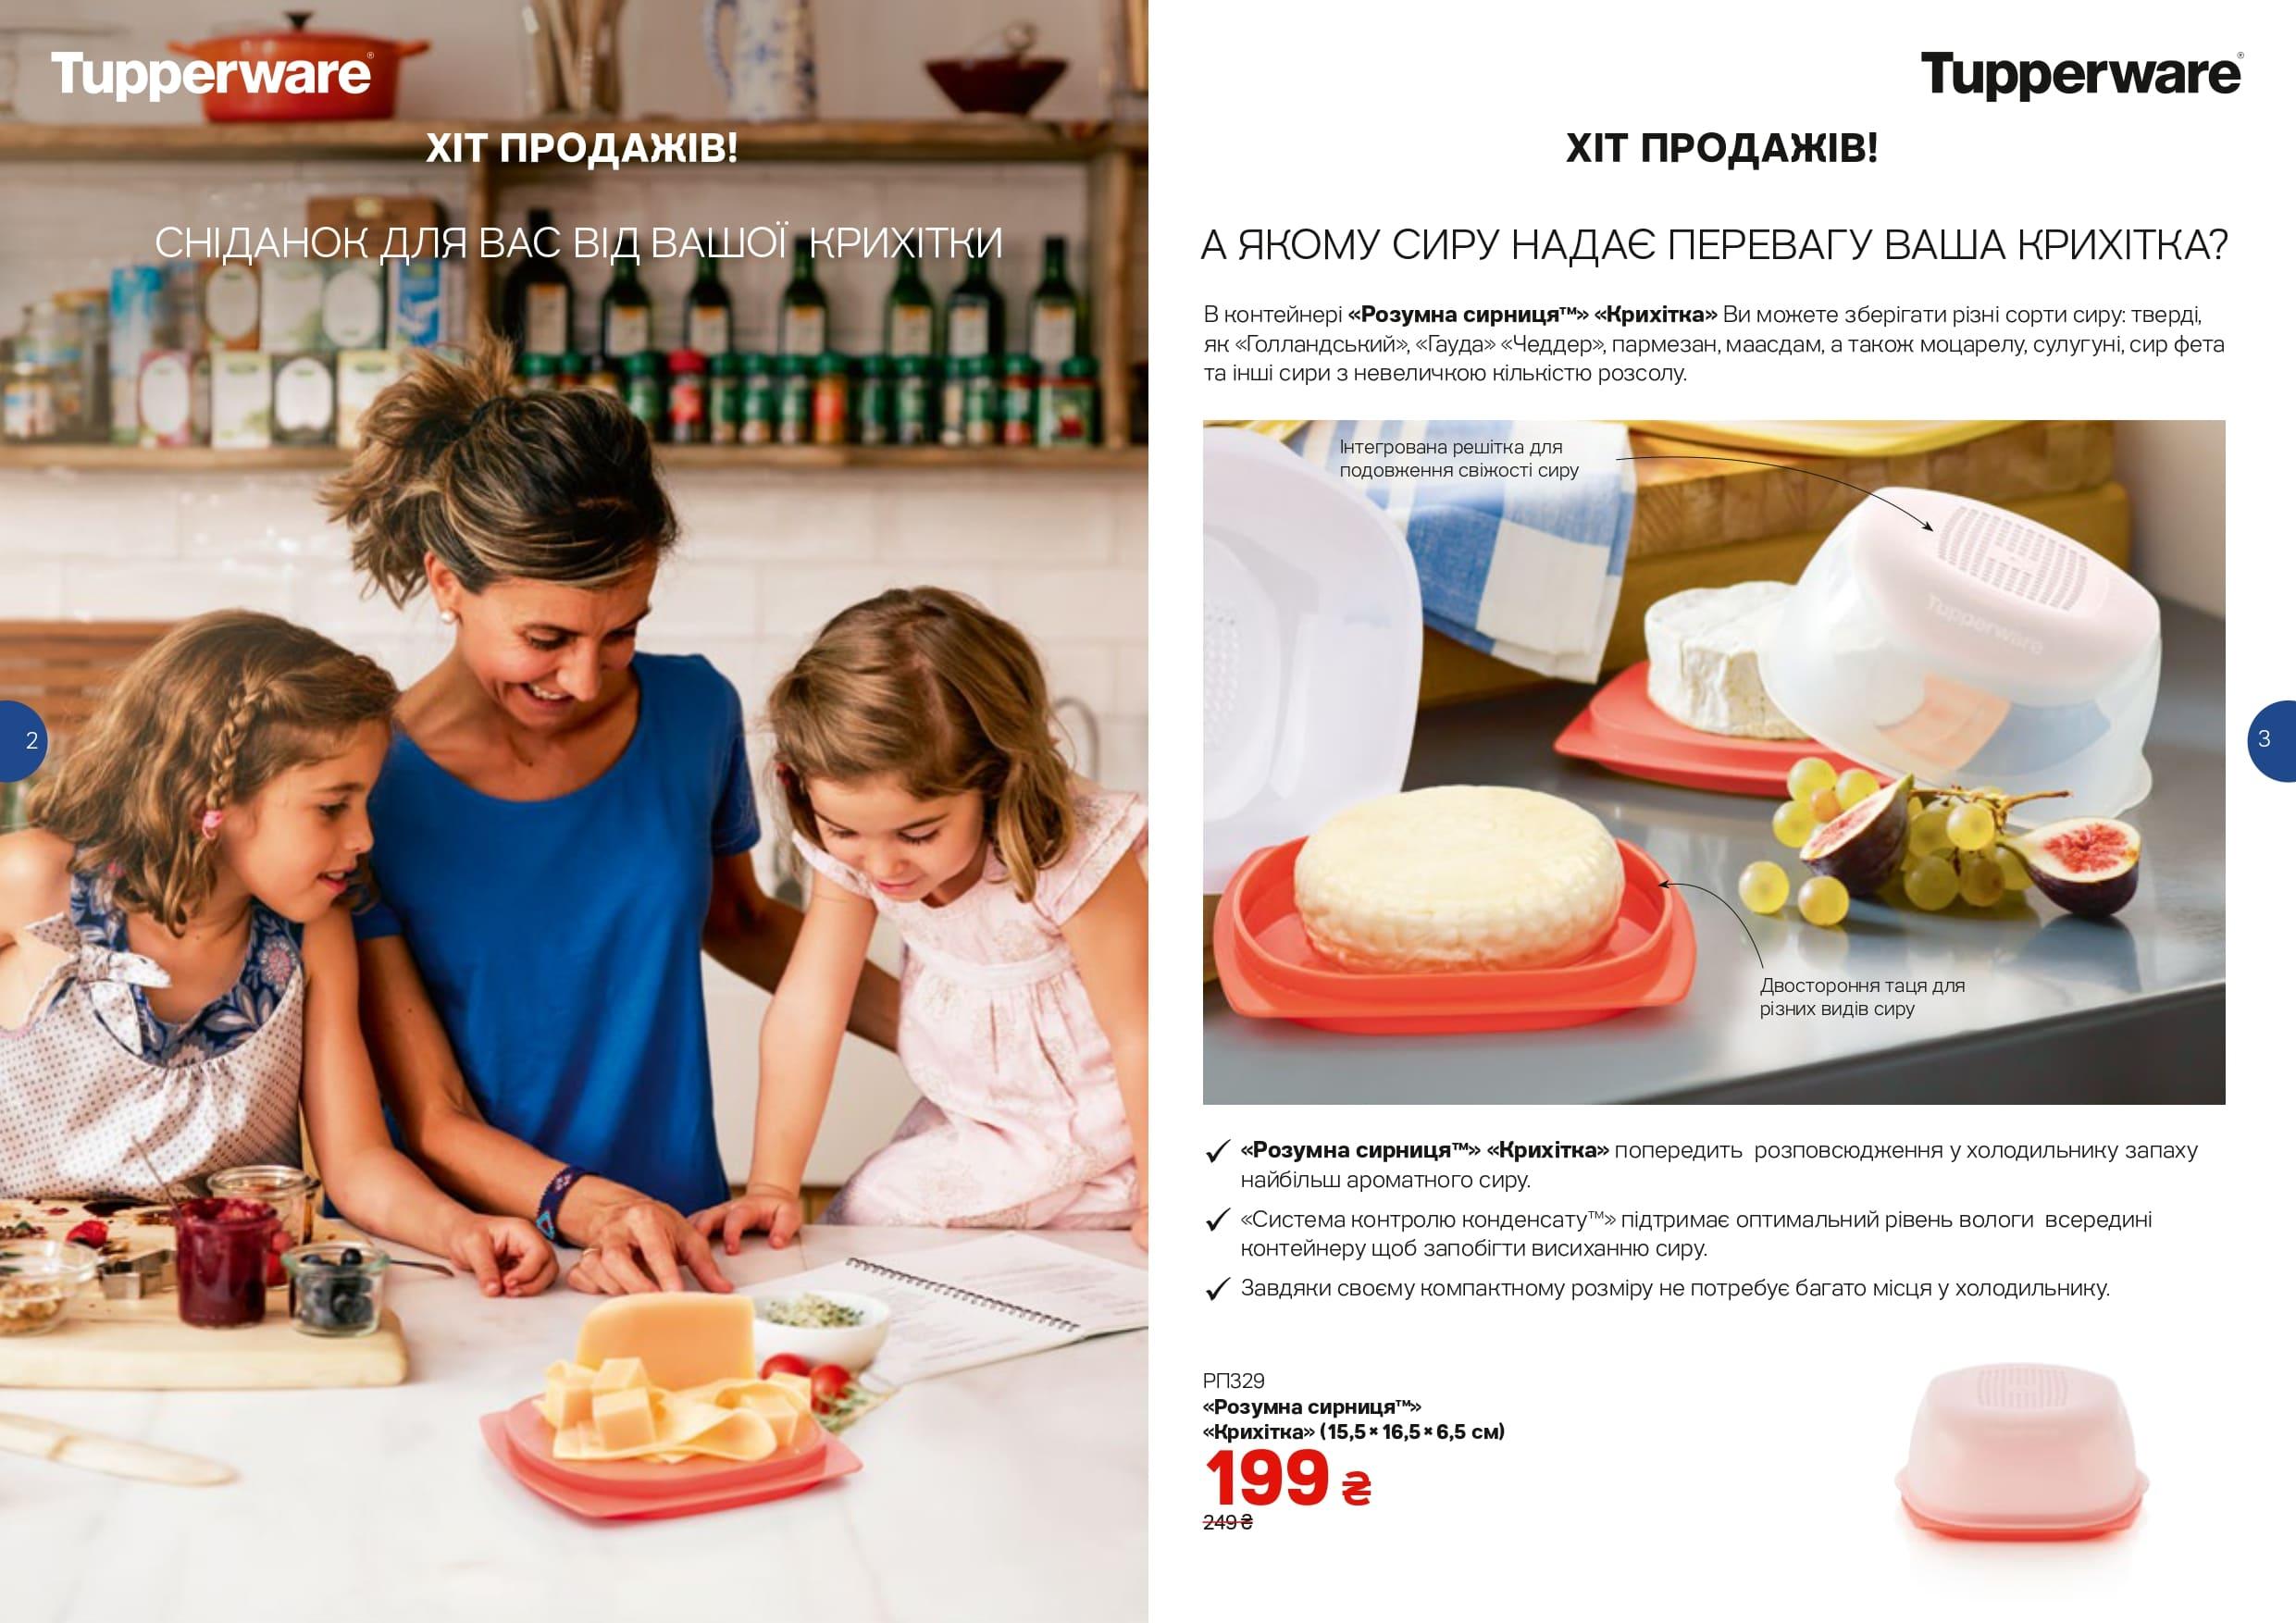 Умная сырница кроха, купить по цене 199,00 грн, скадка 20%.